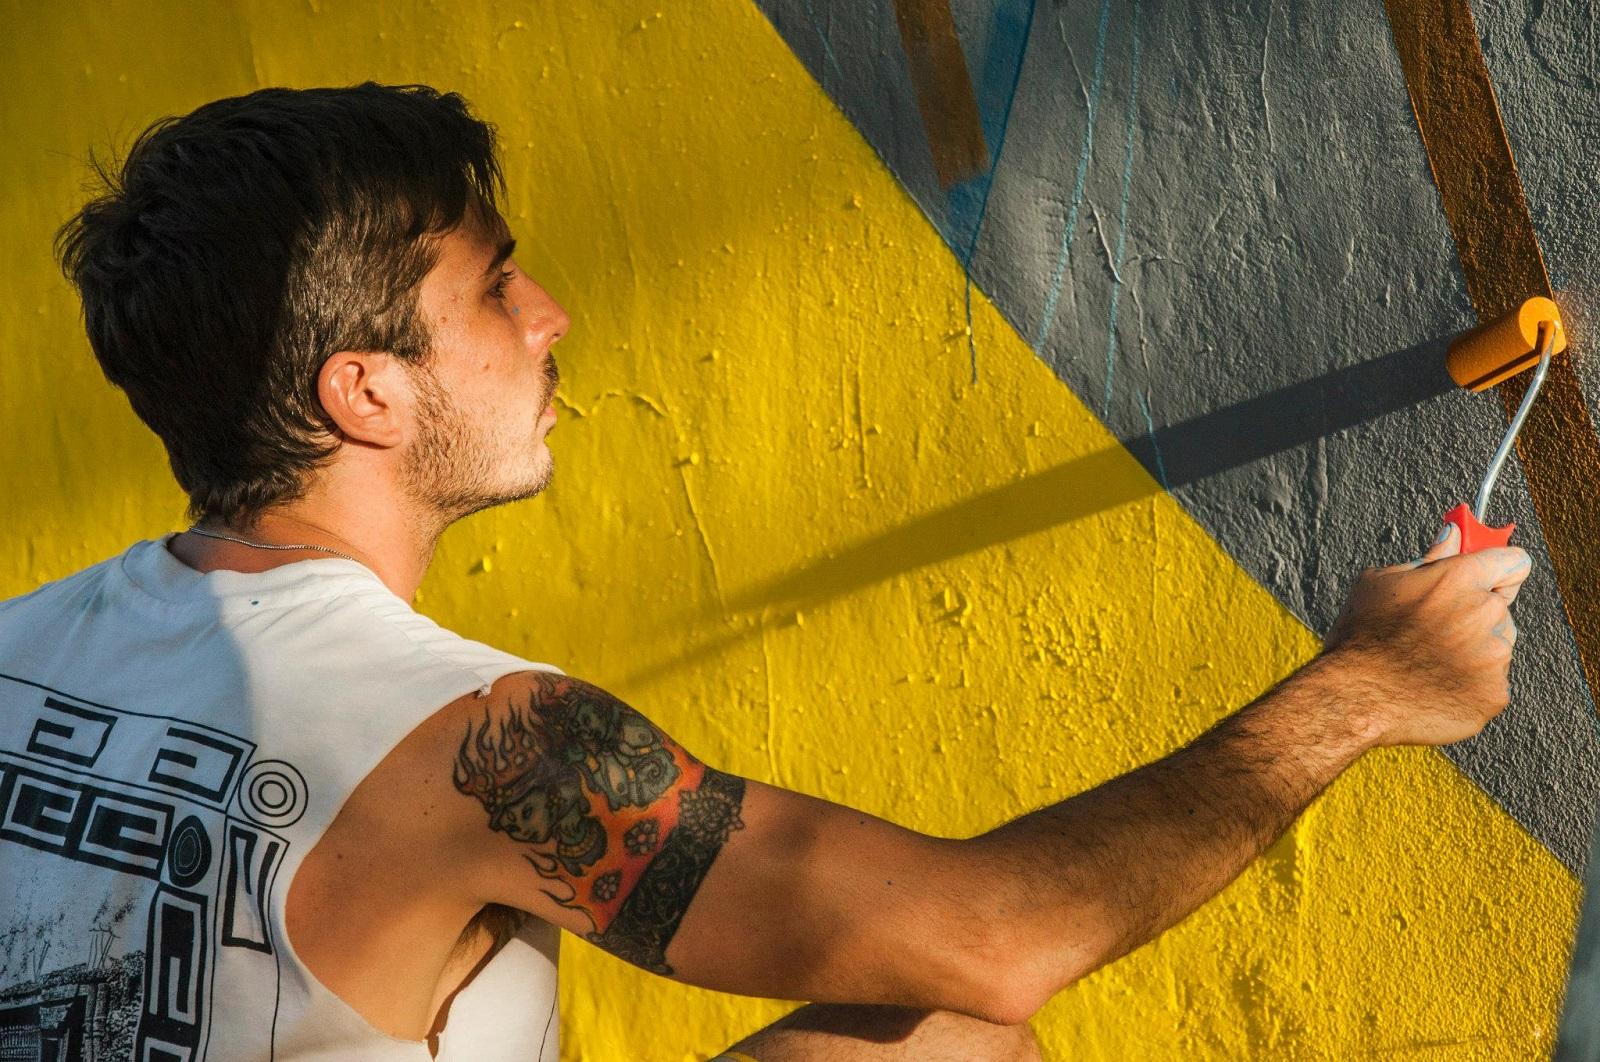 pedro-perelman-new-mural-for-oficio-residence-03